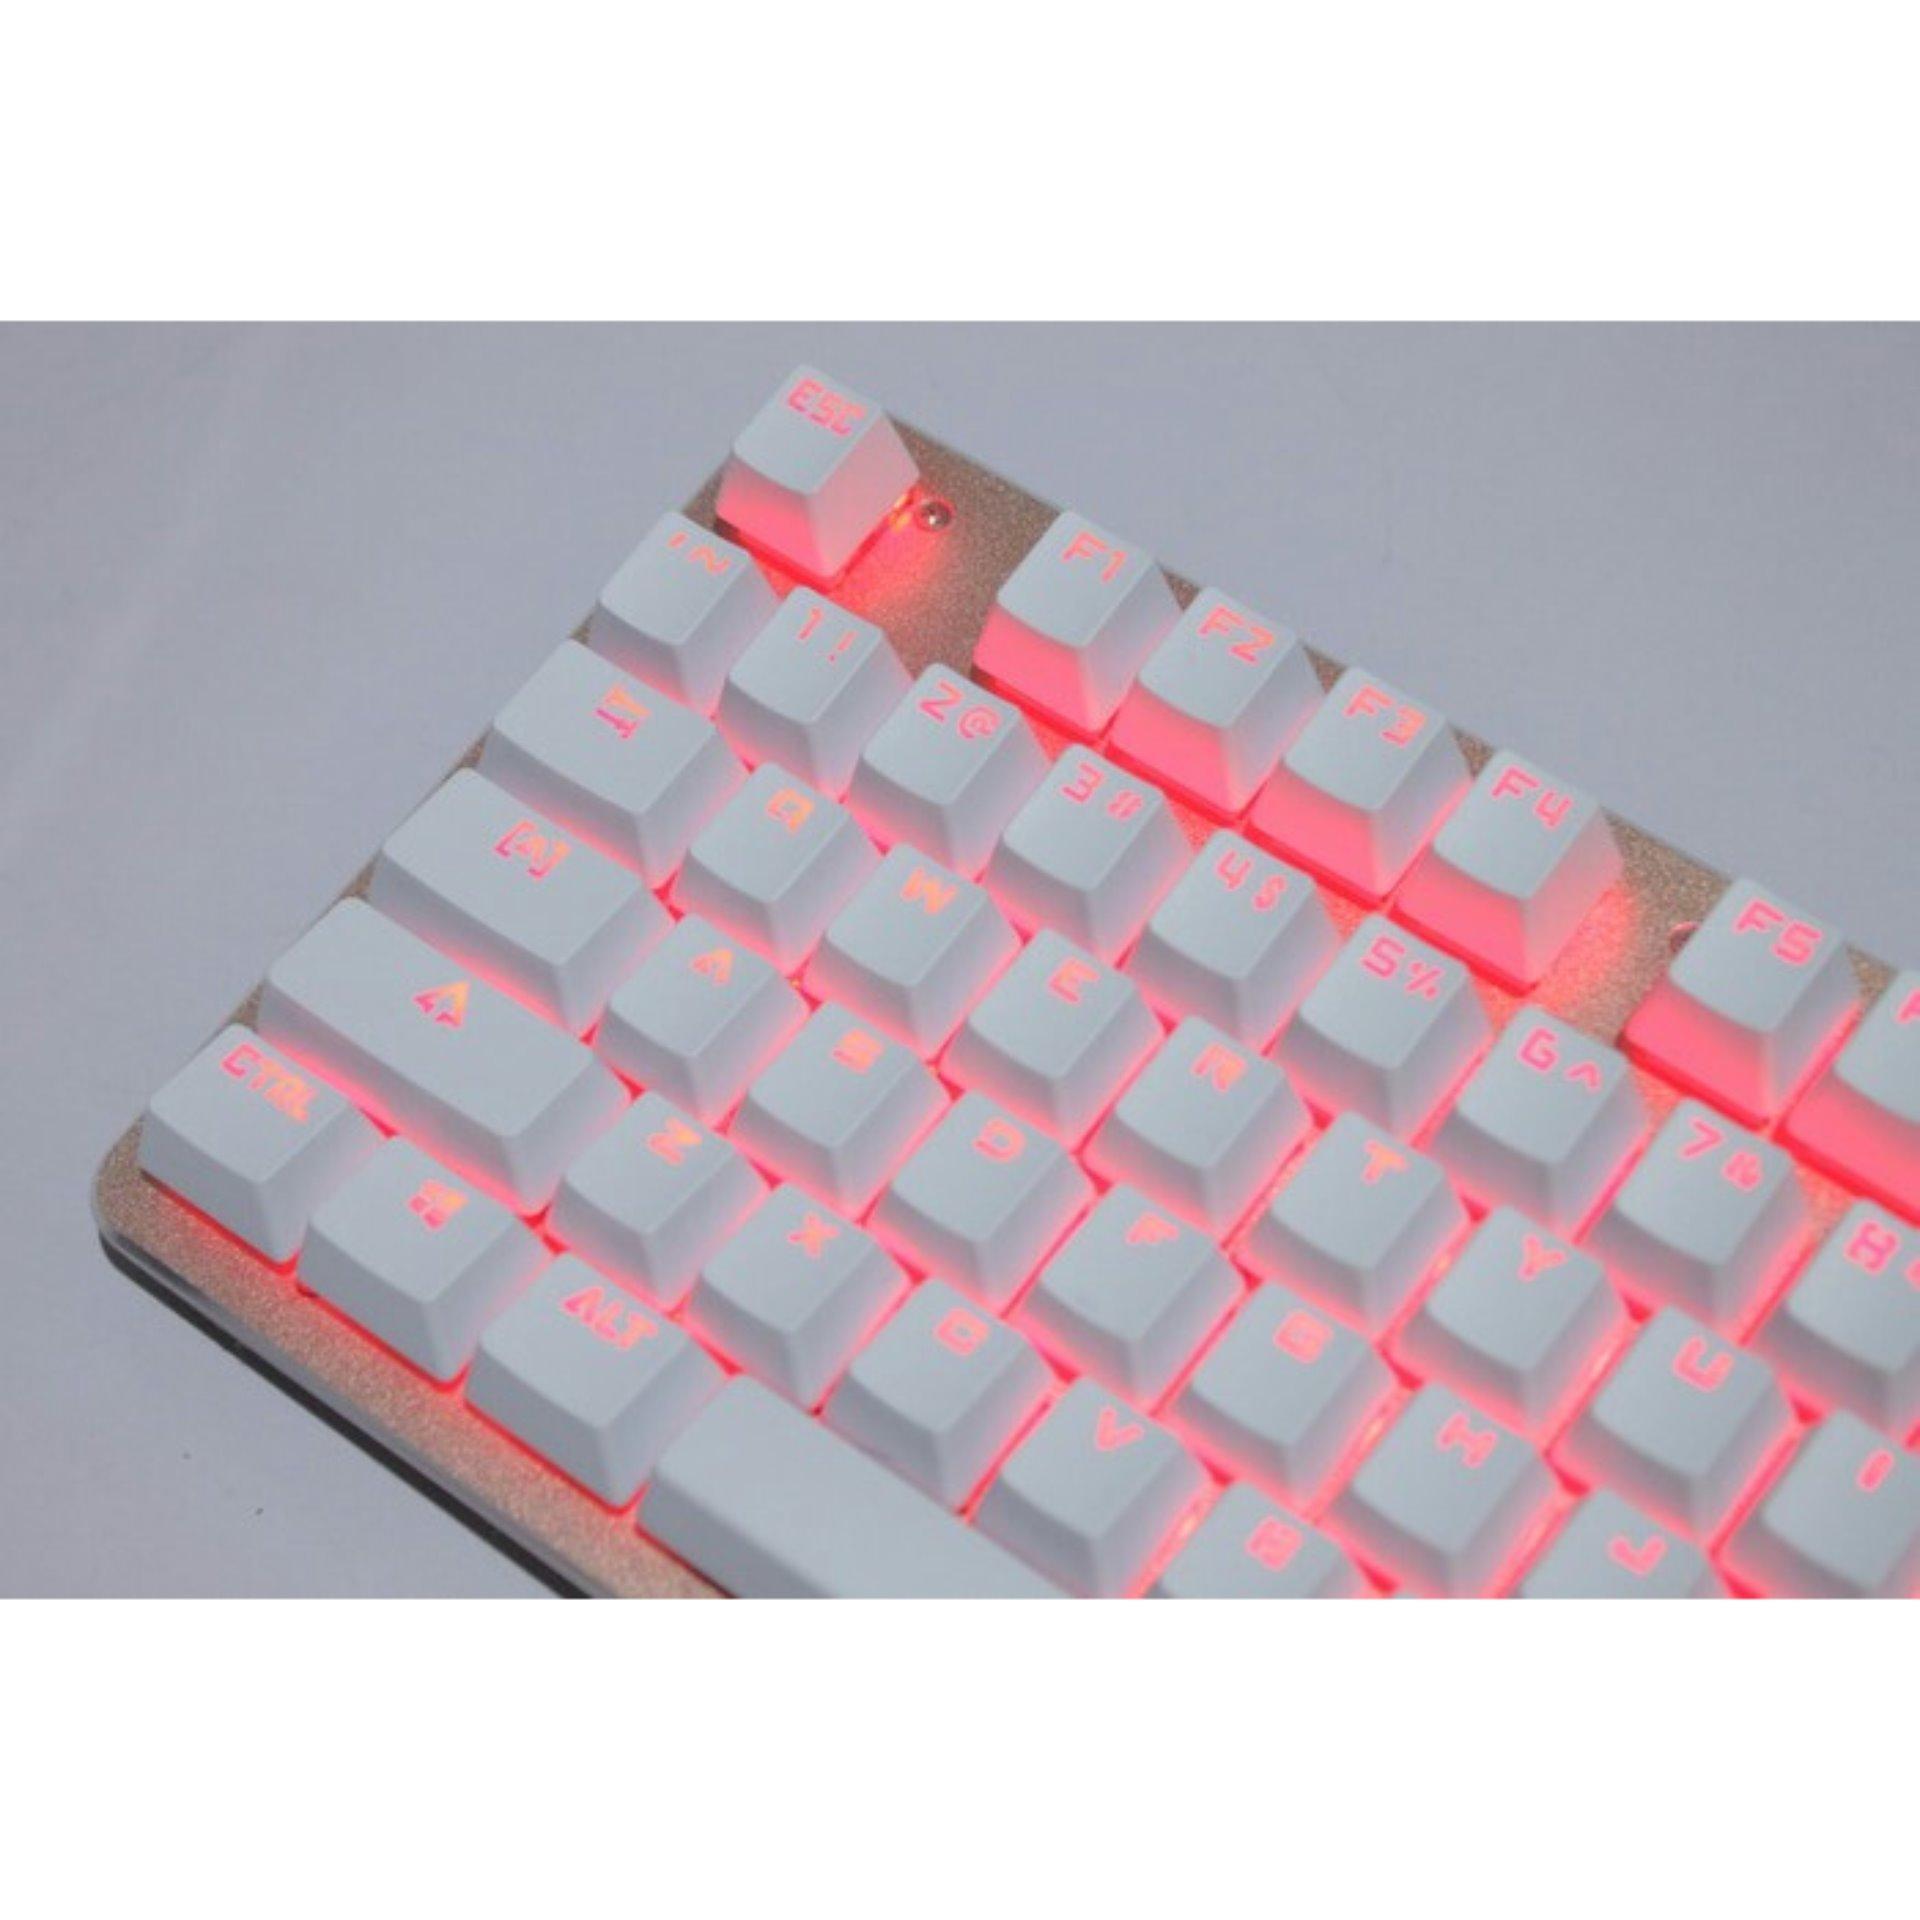 Pencarian Termurah Keyboard Gaming Rexus Mx3 Mechanical Legionare Kx1 Backlight Semi Rgb